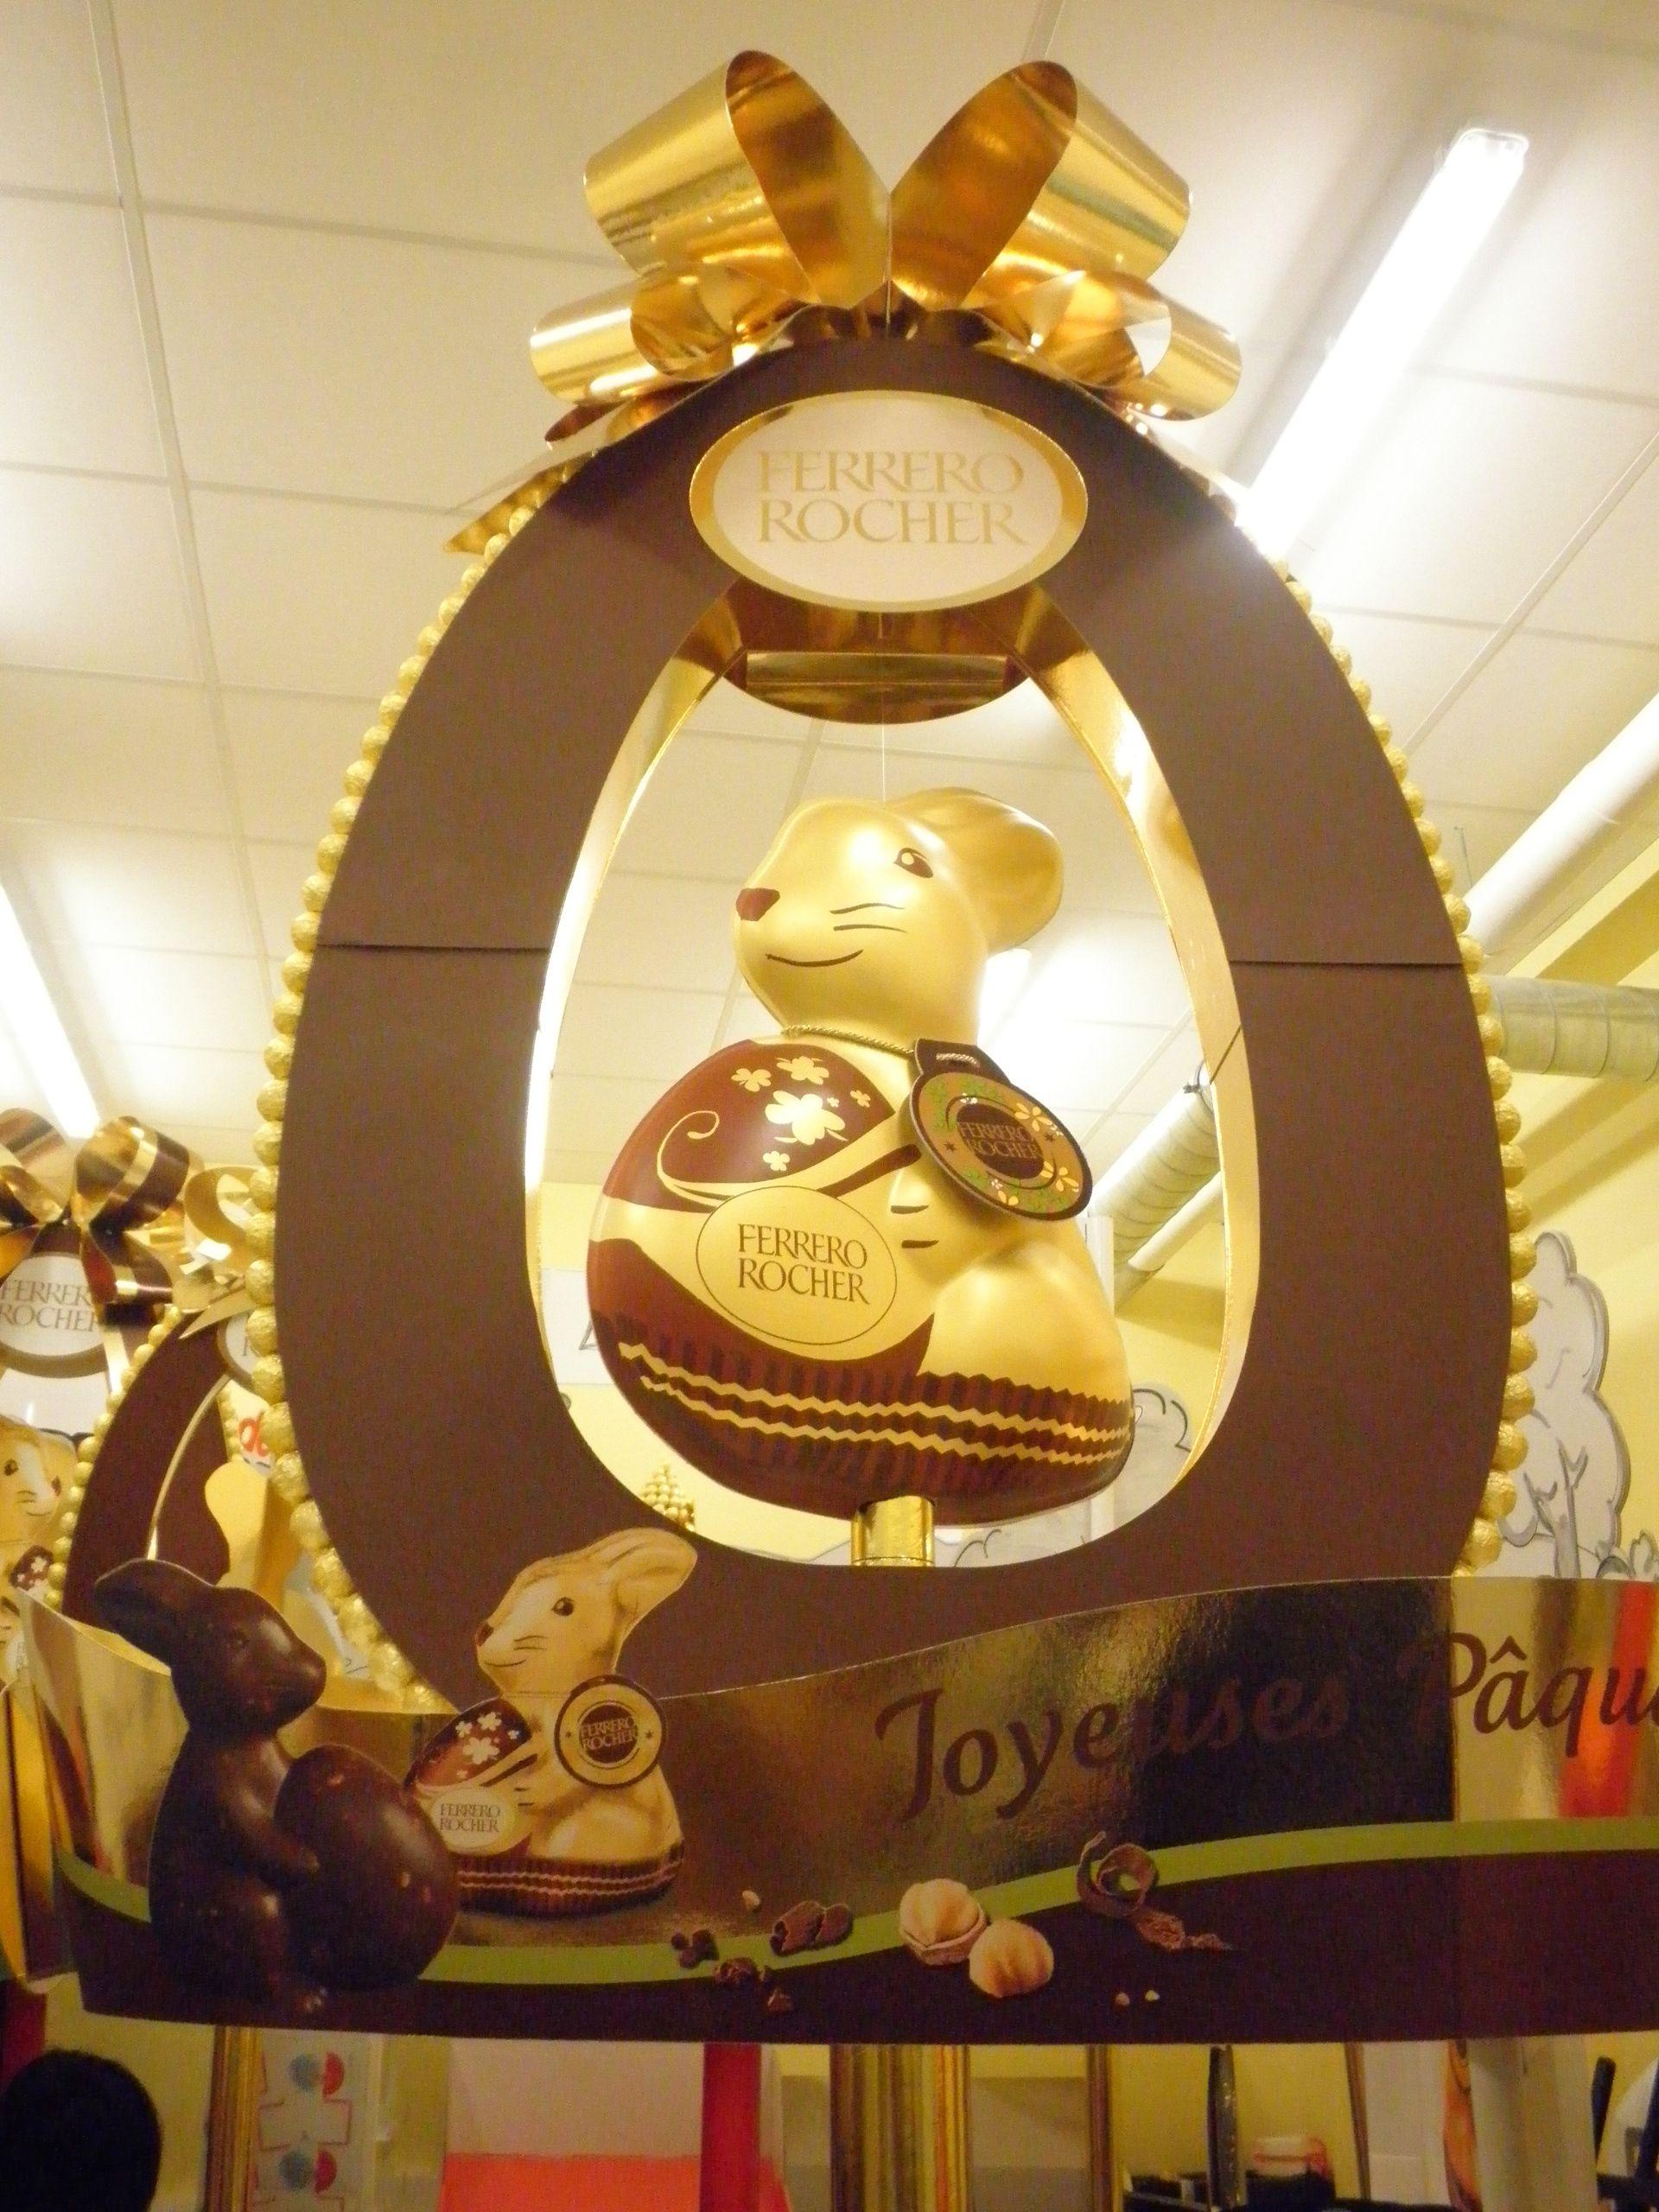 PLV îlot Ferrero Rocher Pâques France 2014